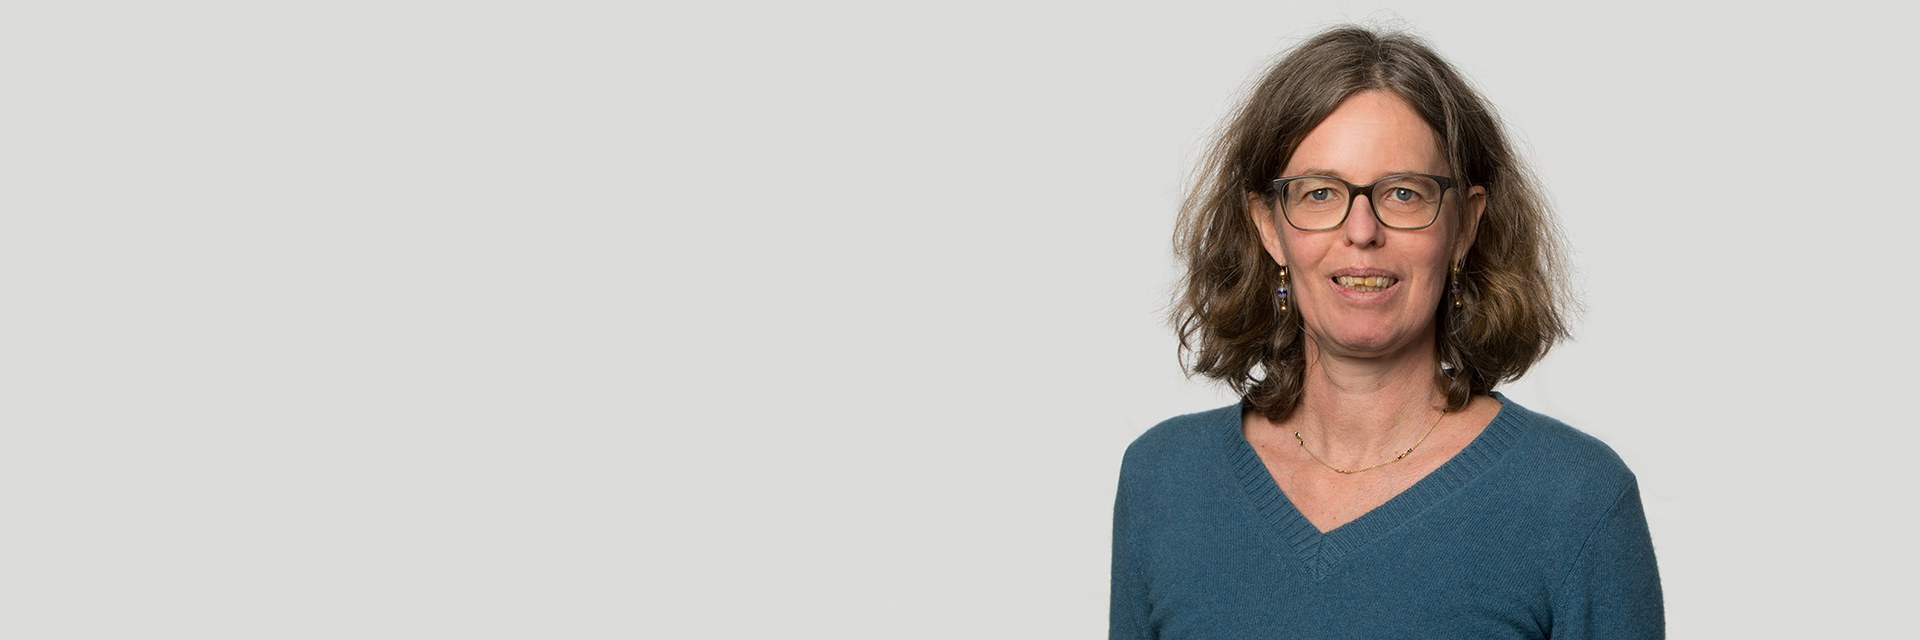 Prof. Dr. Luzia Jurt